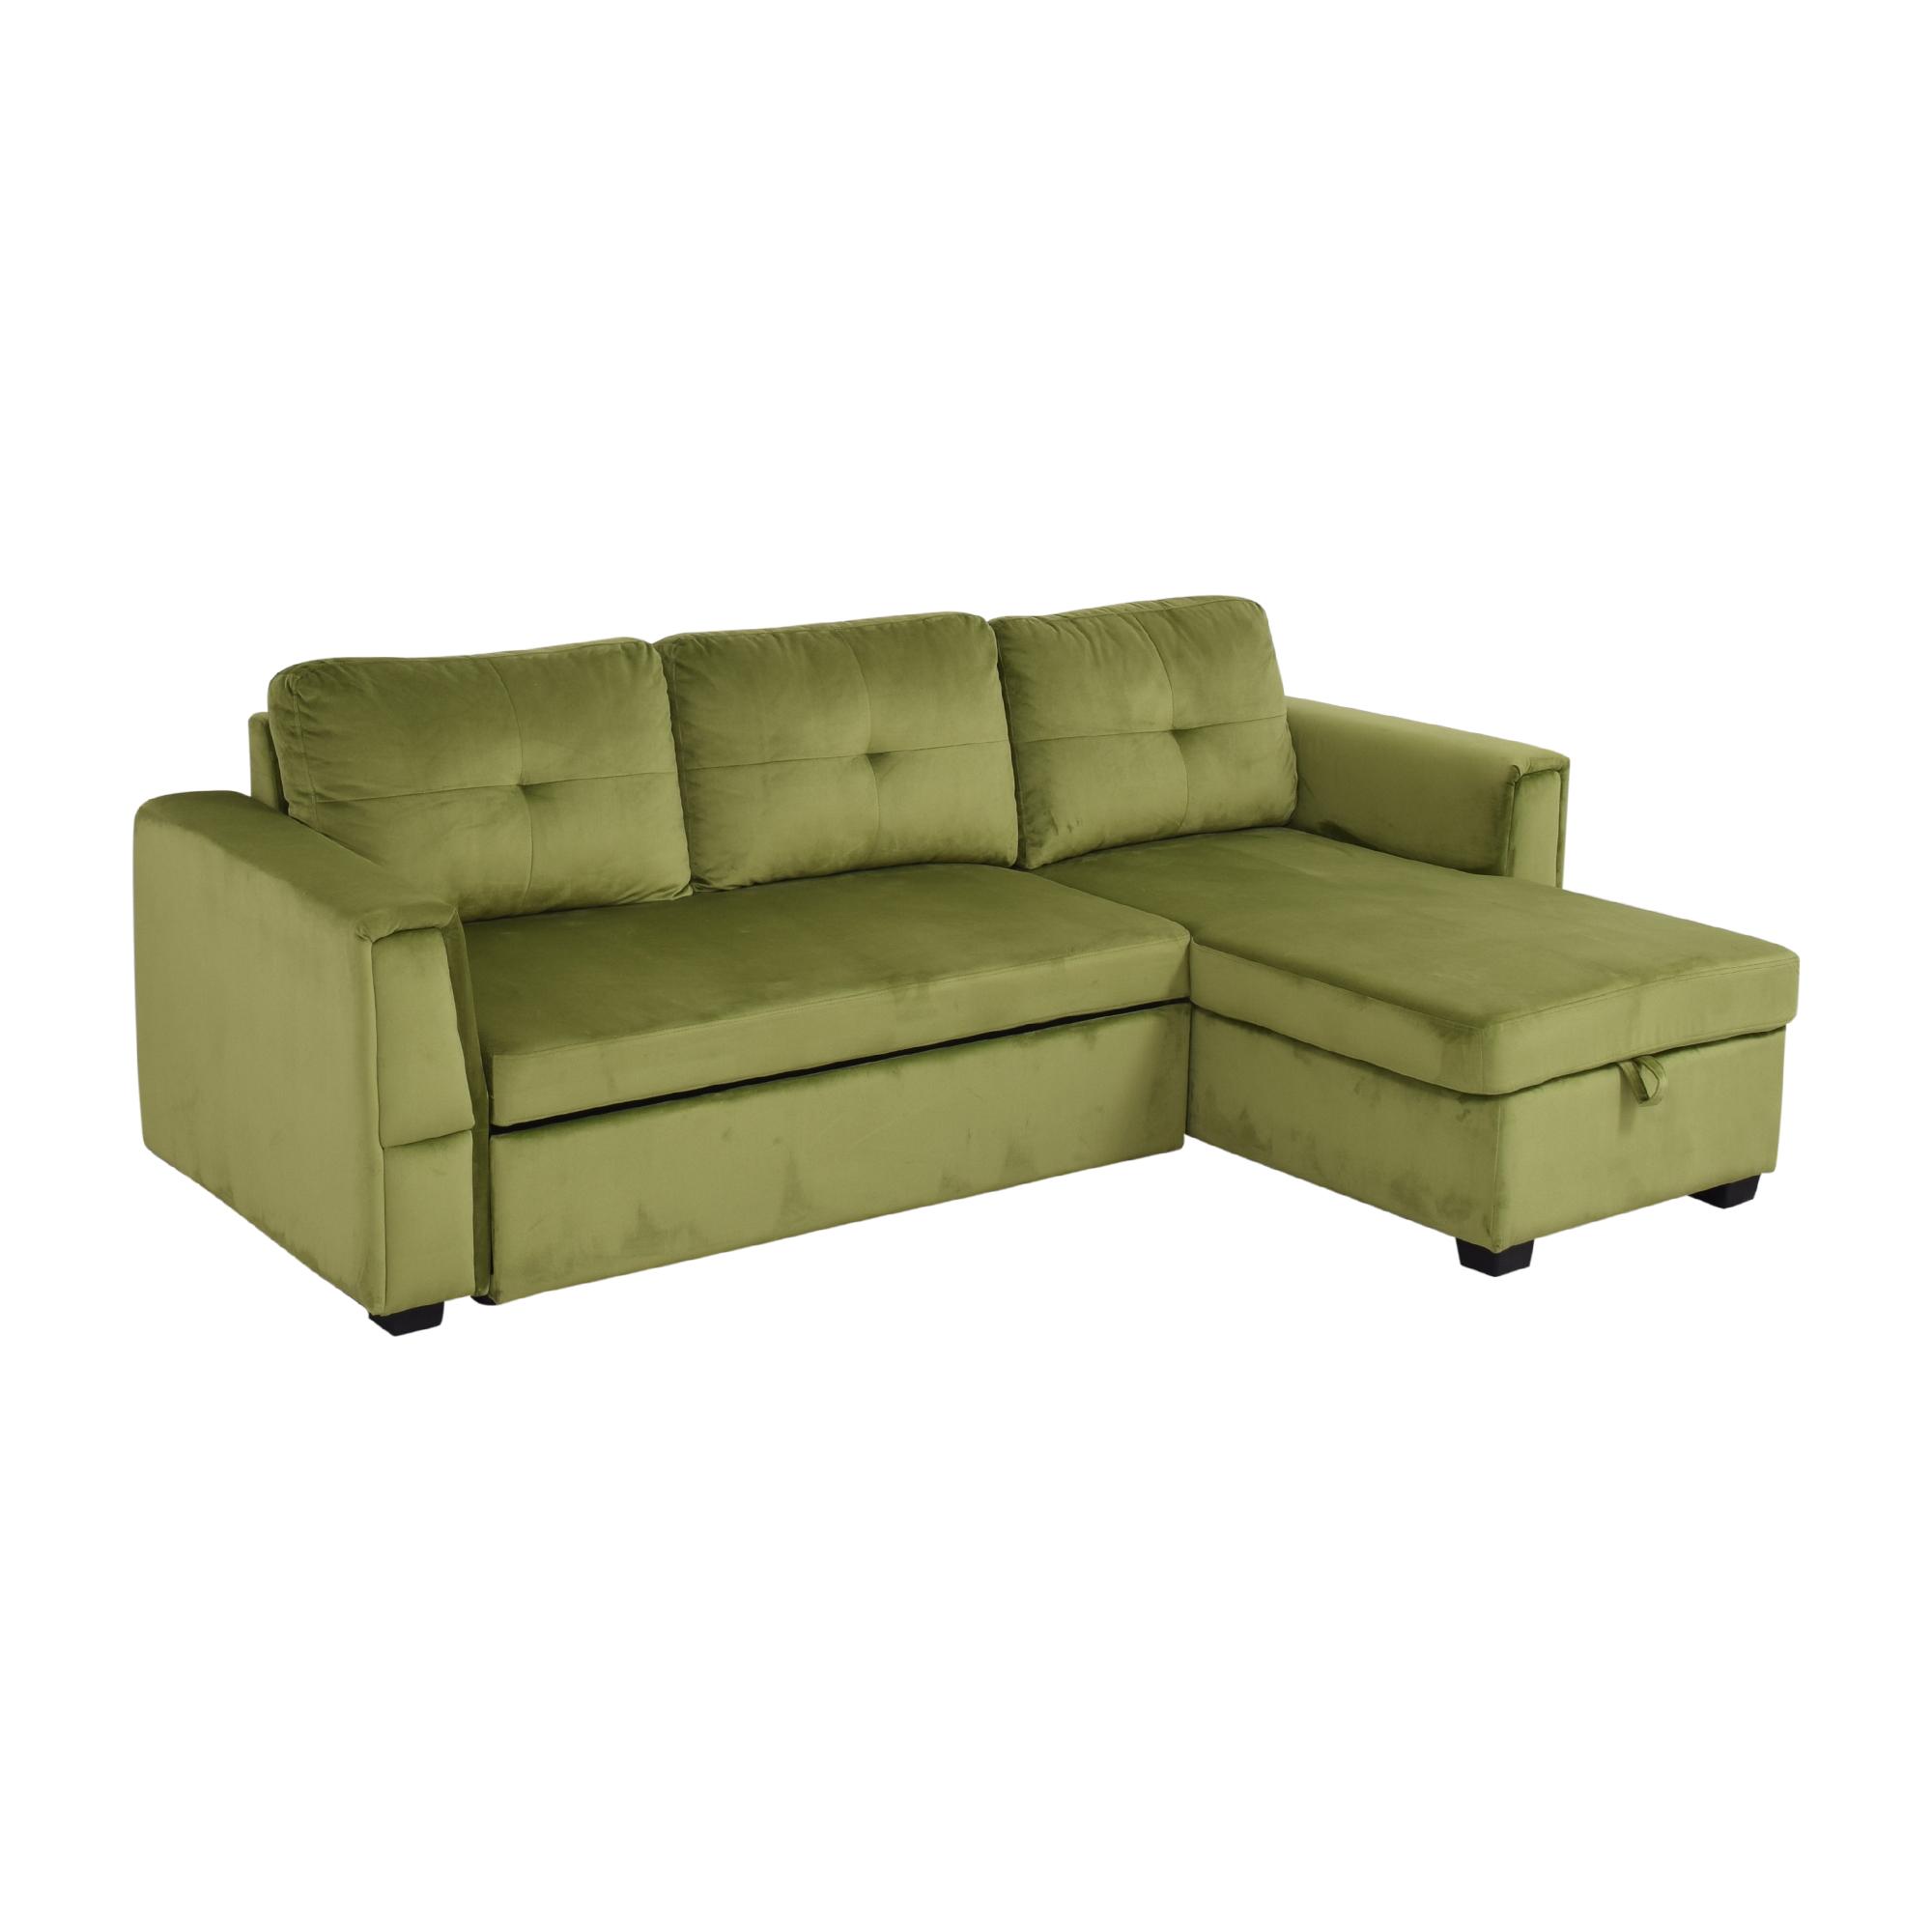 Wayfair Wayfair Mercer41 Nelda Round Arm Sleeper Sofa nyc